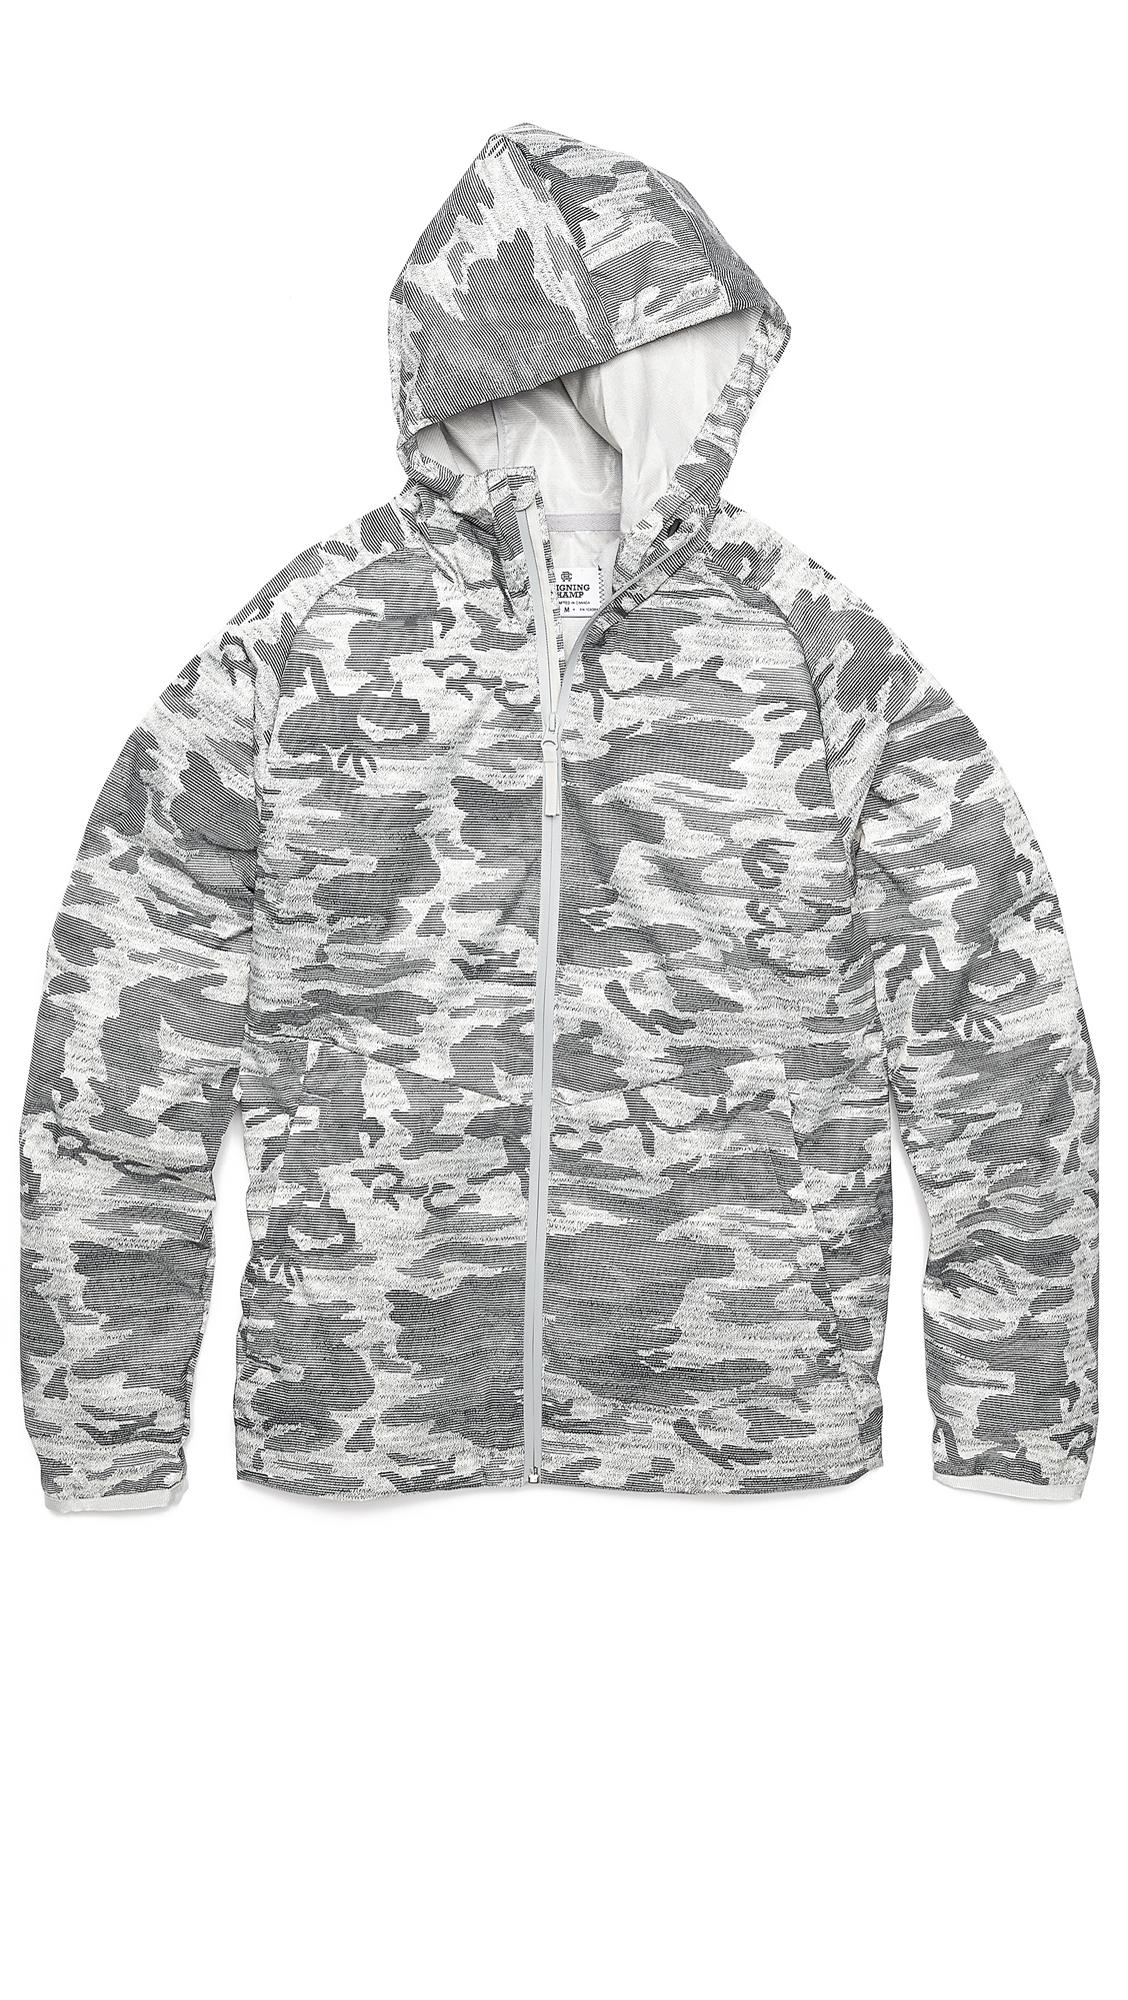 Steven Alan Camo Print Hooded Jacket in Heather Grey (Grey) for Men